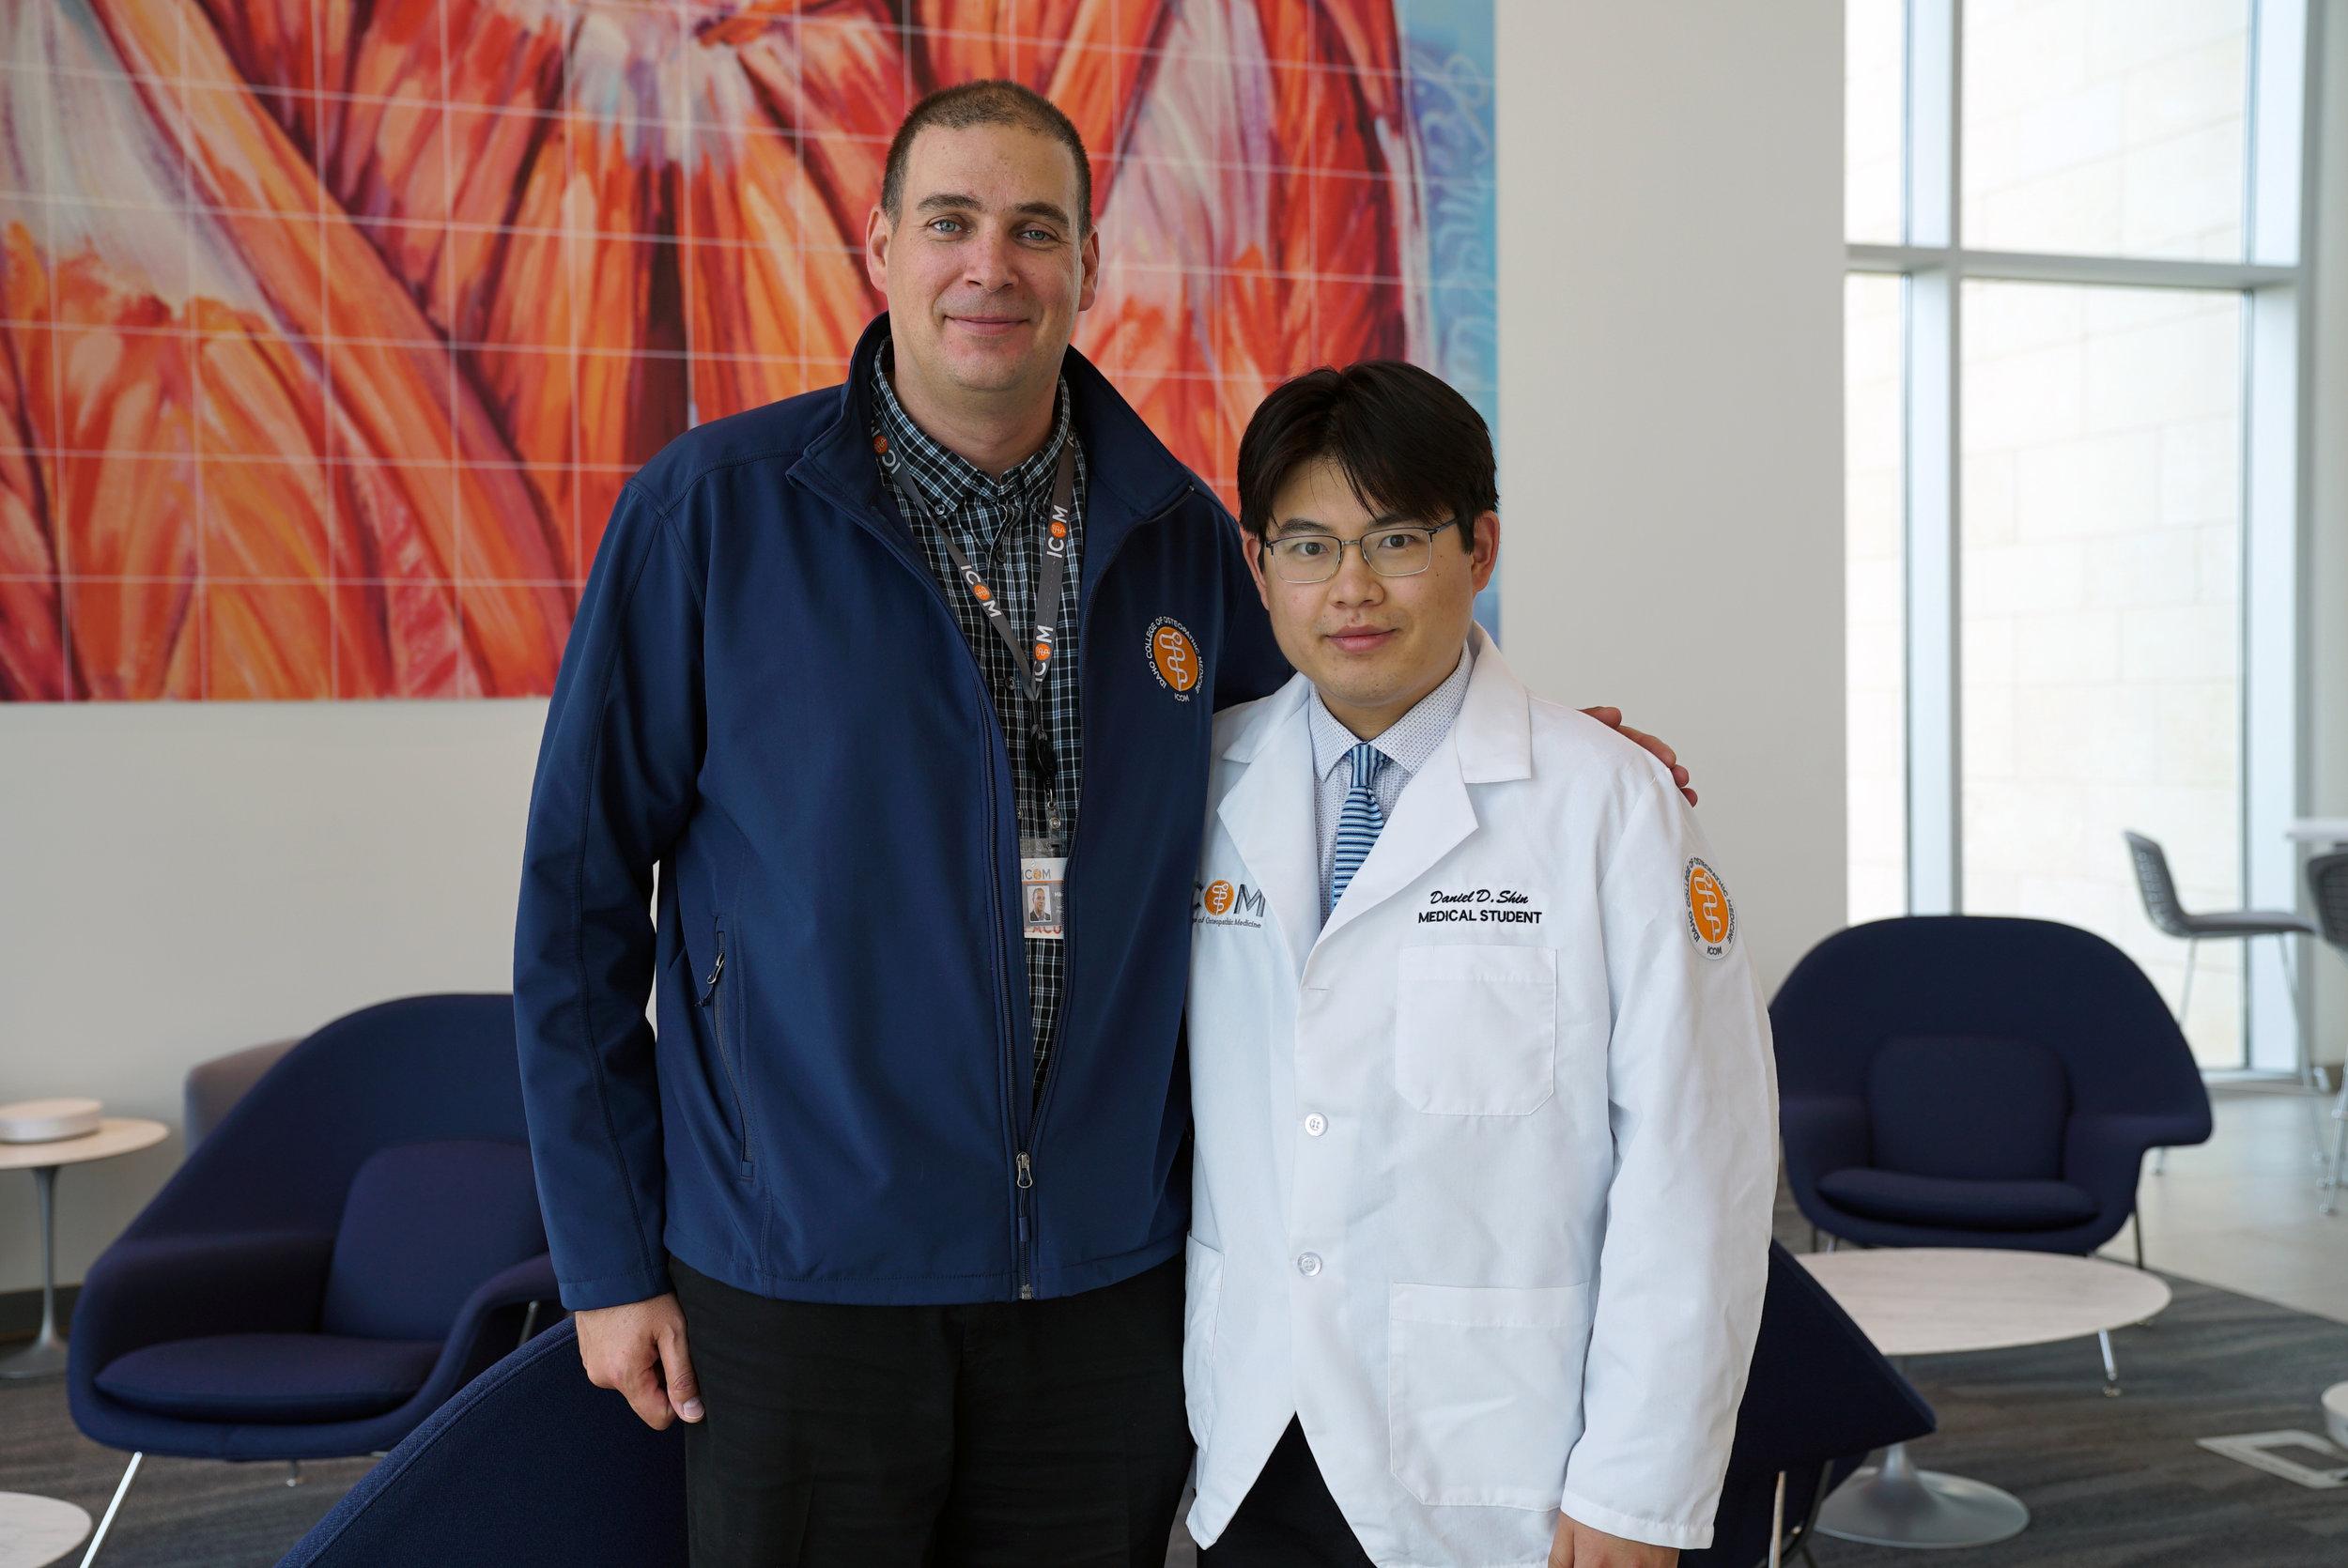 (L-R) Dr. Mihail Mitov and Student Doctor Daniel Shin.